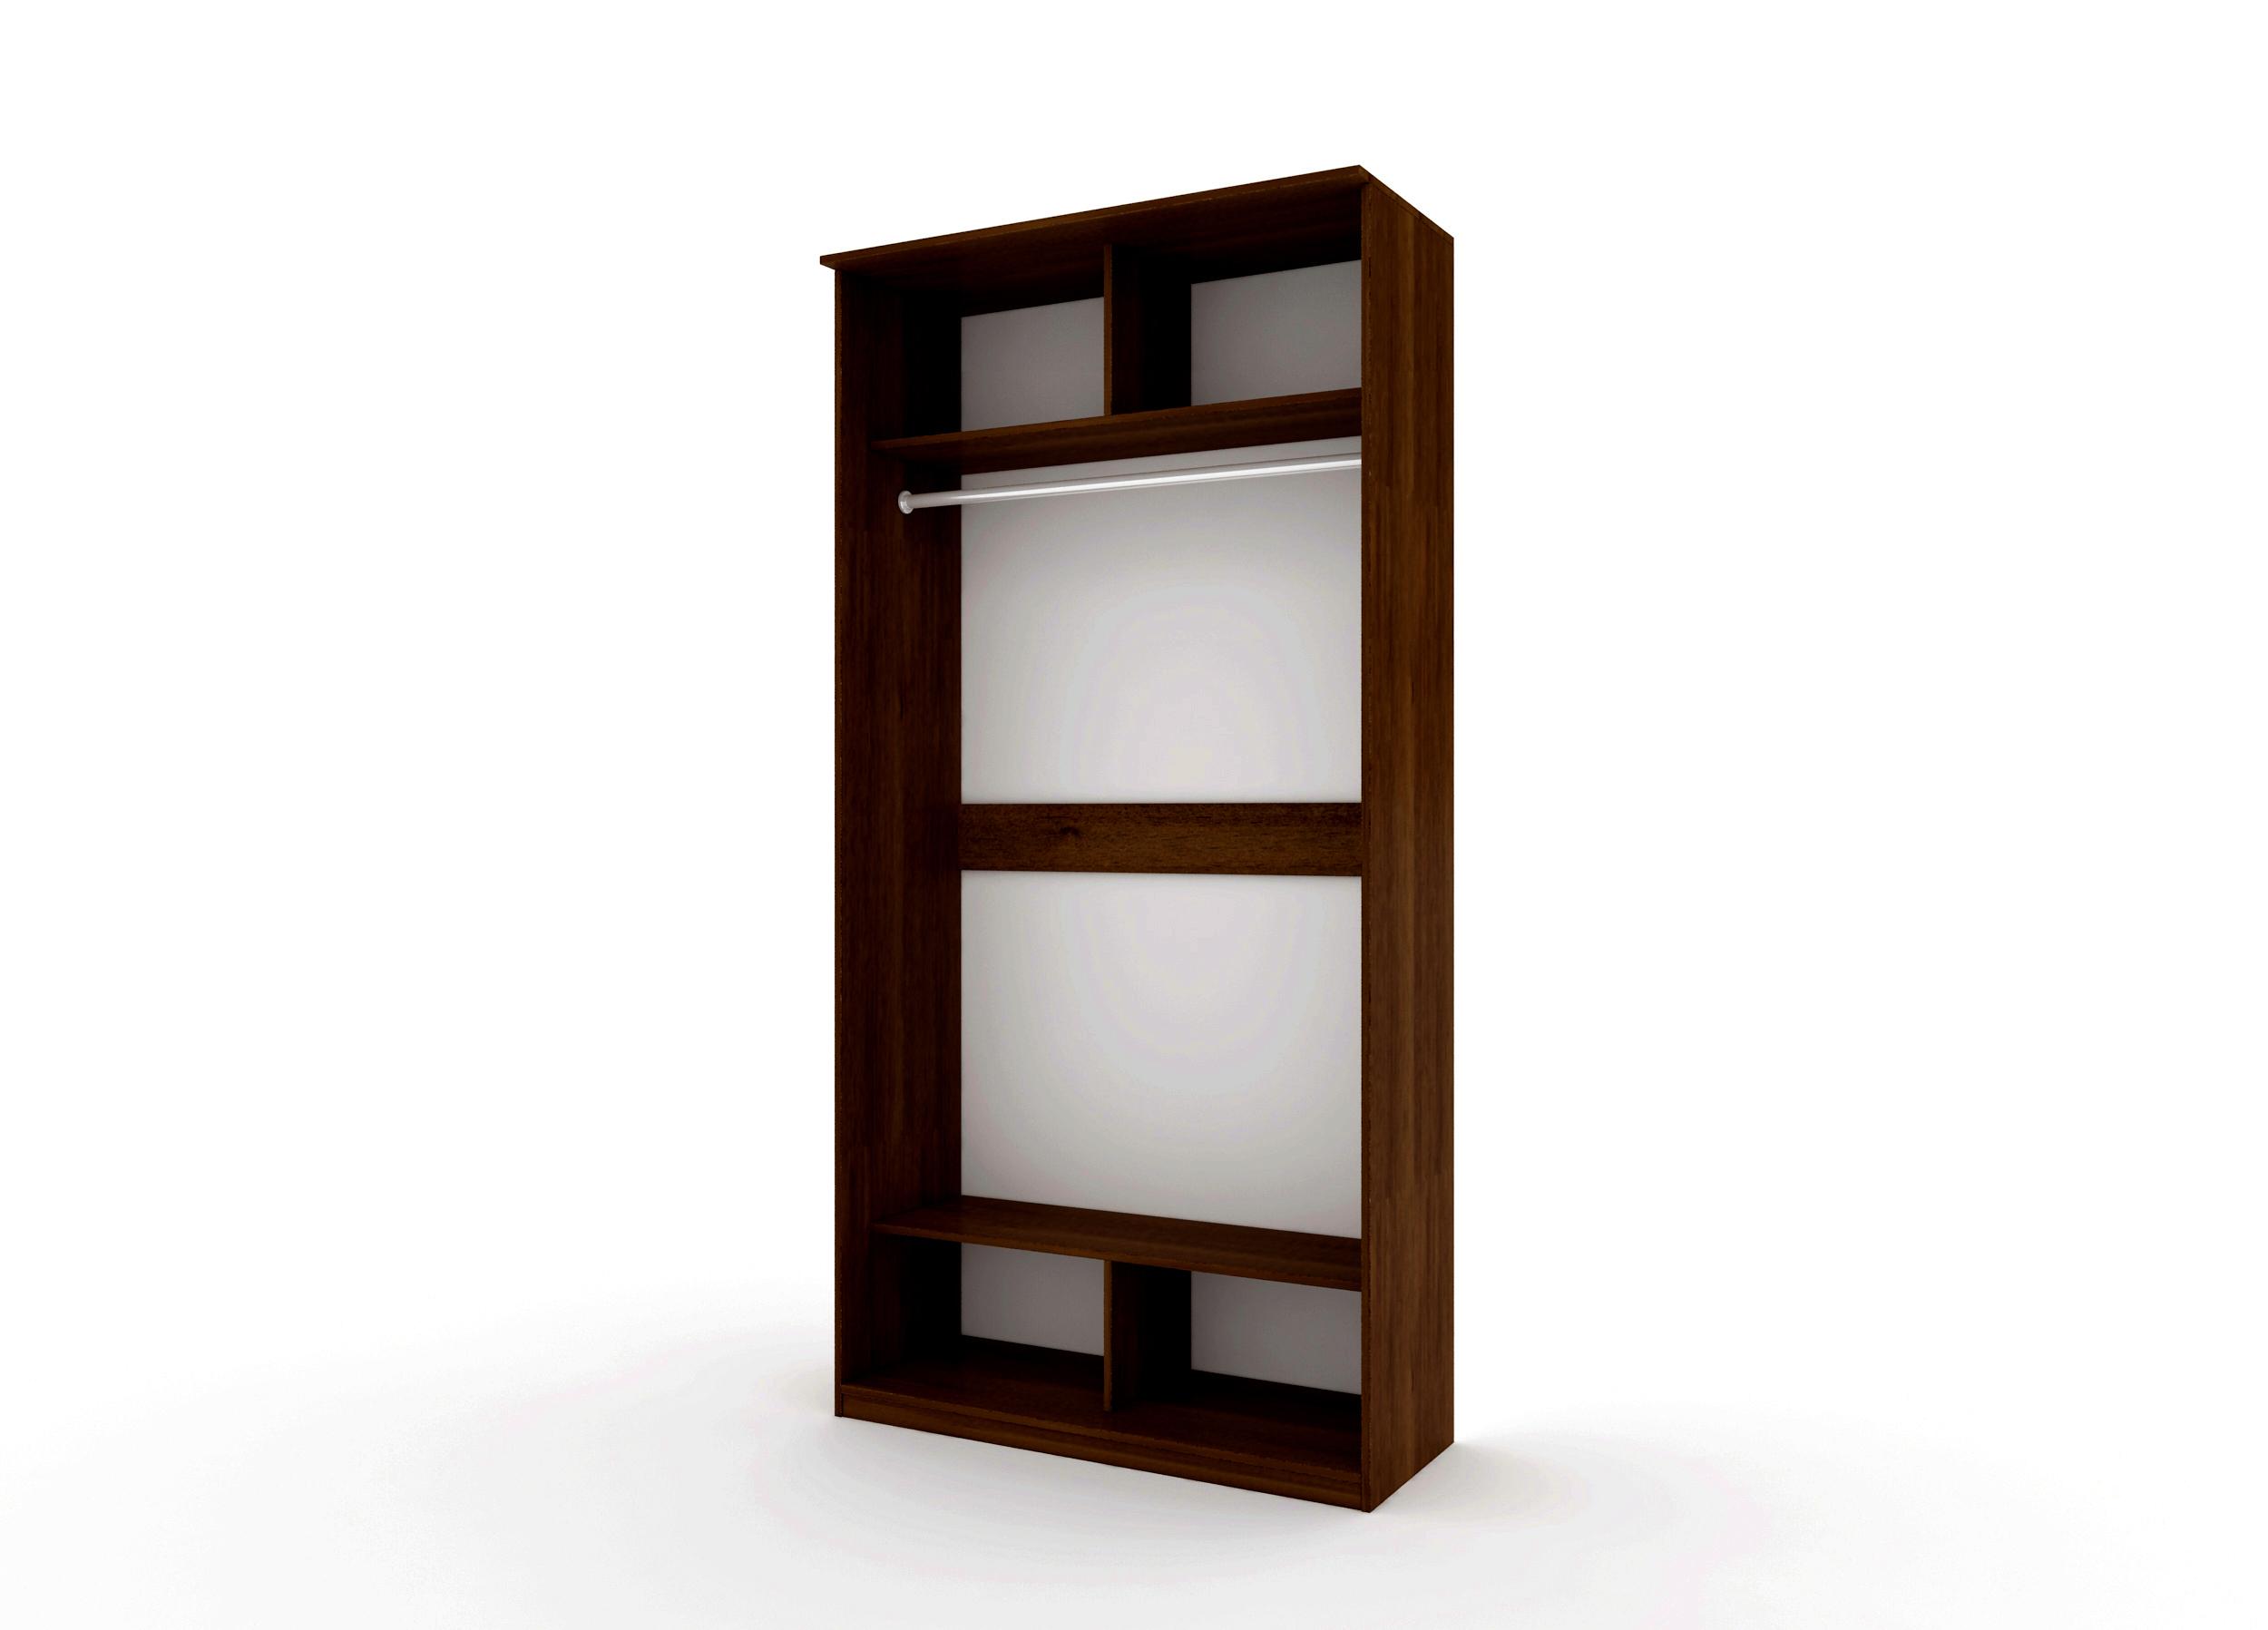 Шкаф купе Топ-Лайн 1190 / 600 / 1 секция / 2 зеркала